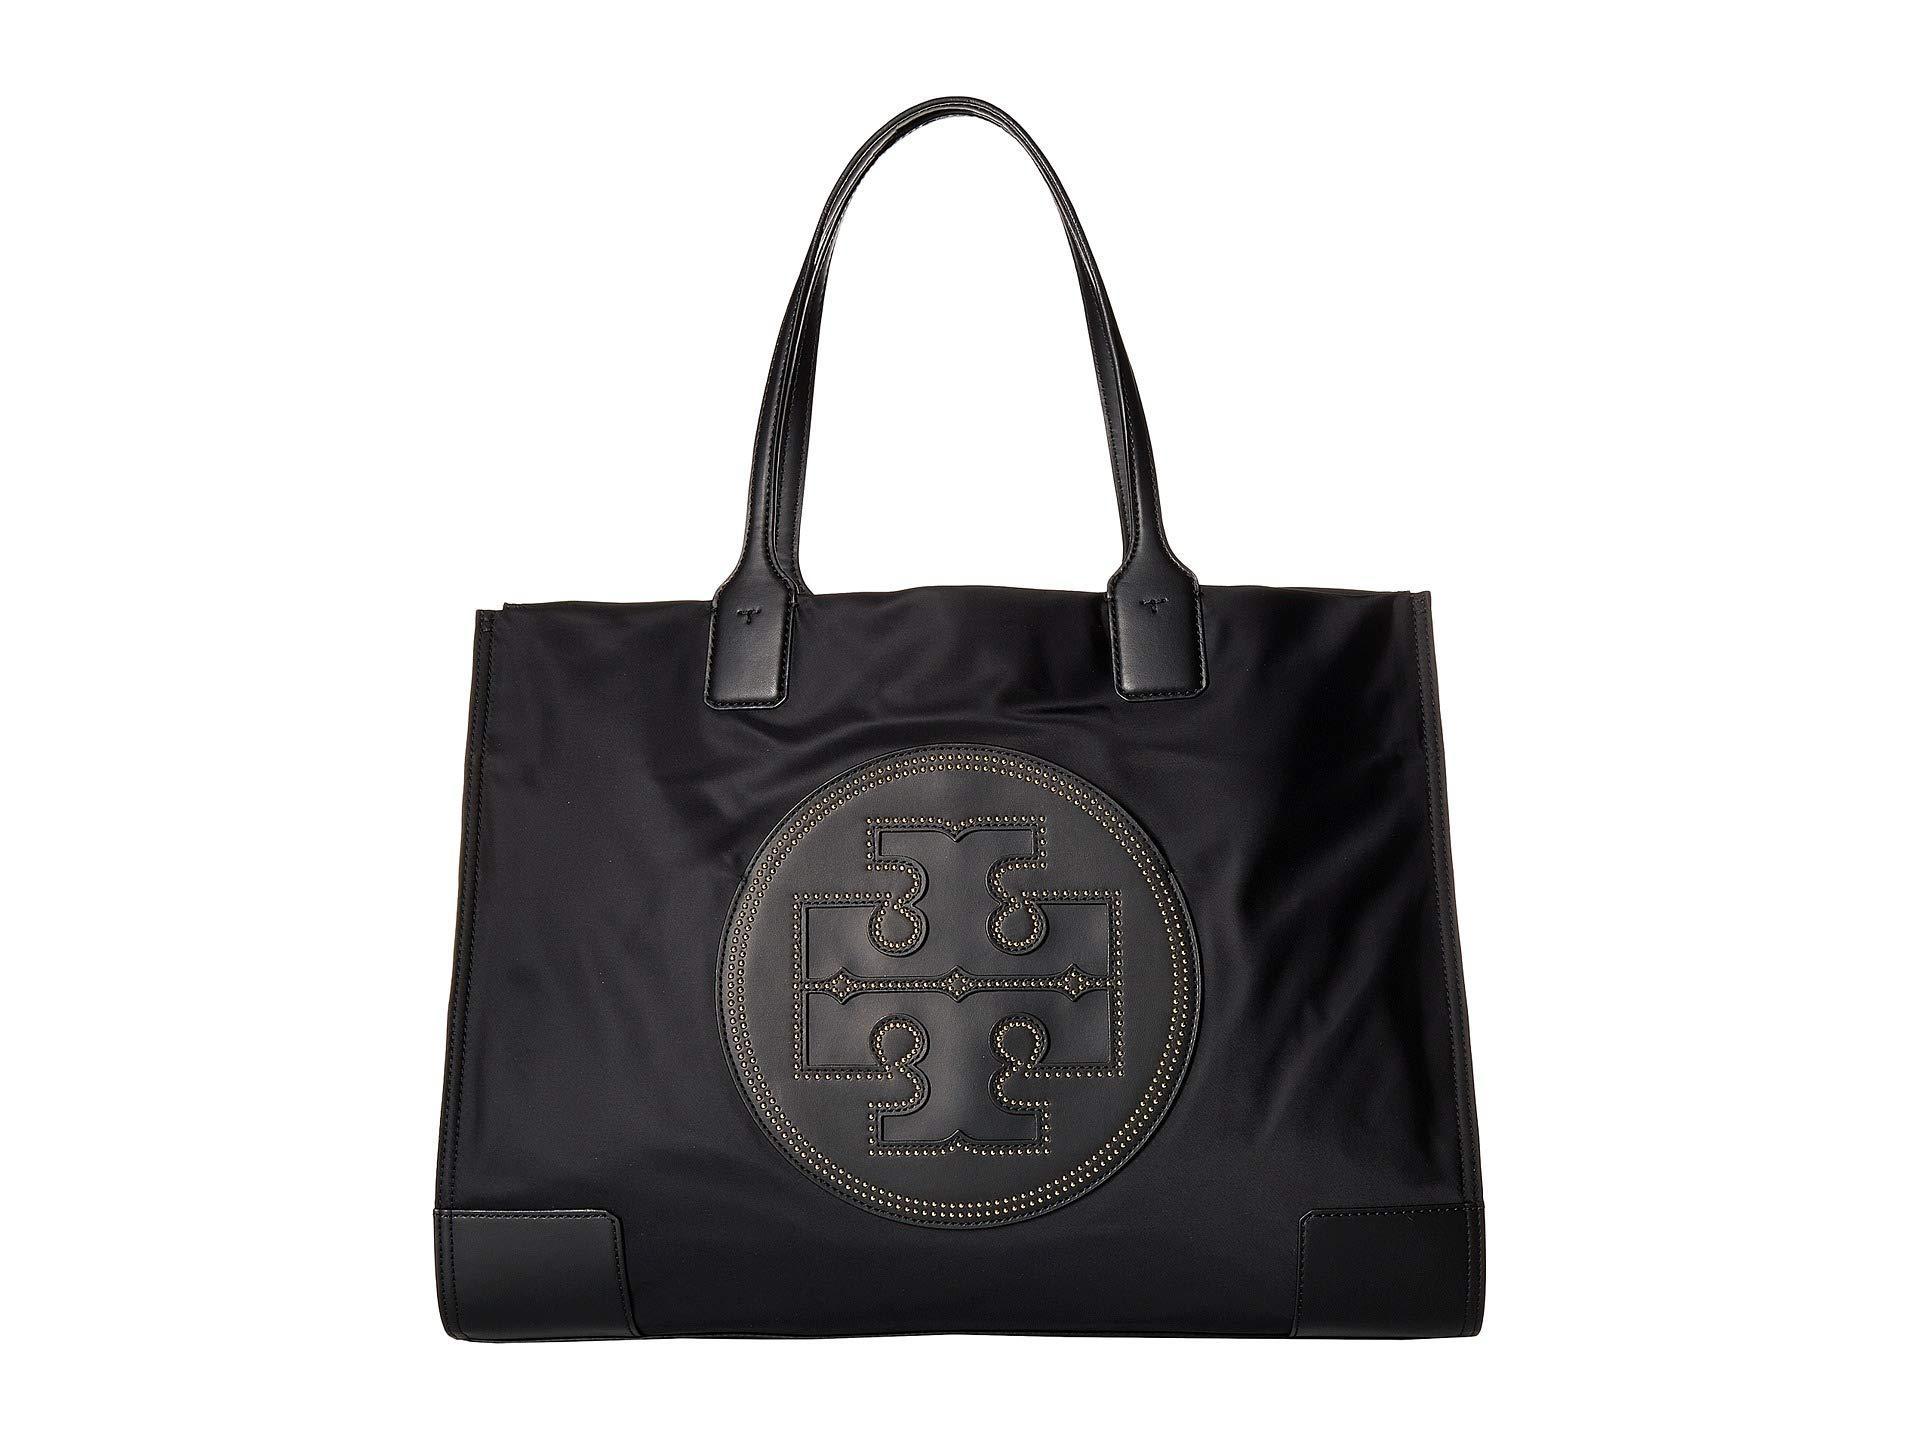 c99011c6005 Lyst - Tory Burch Ella Stud Tote (black) Tote Handbags in Black